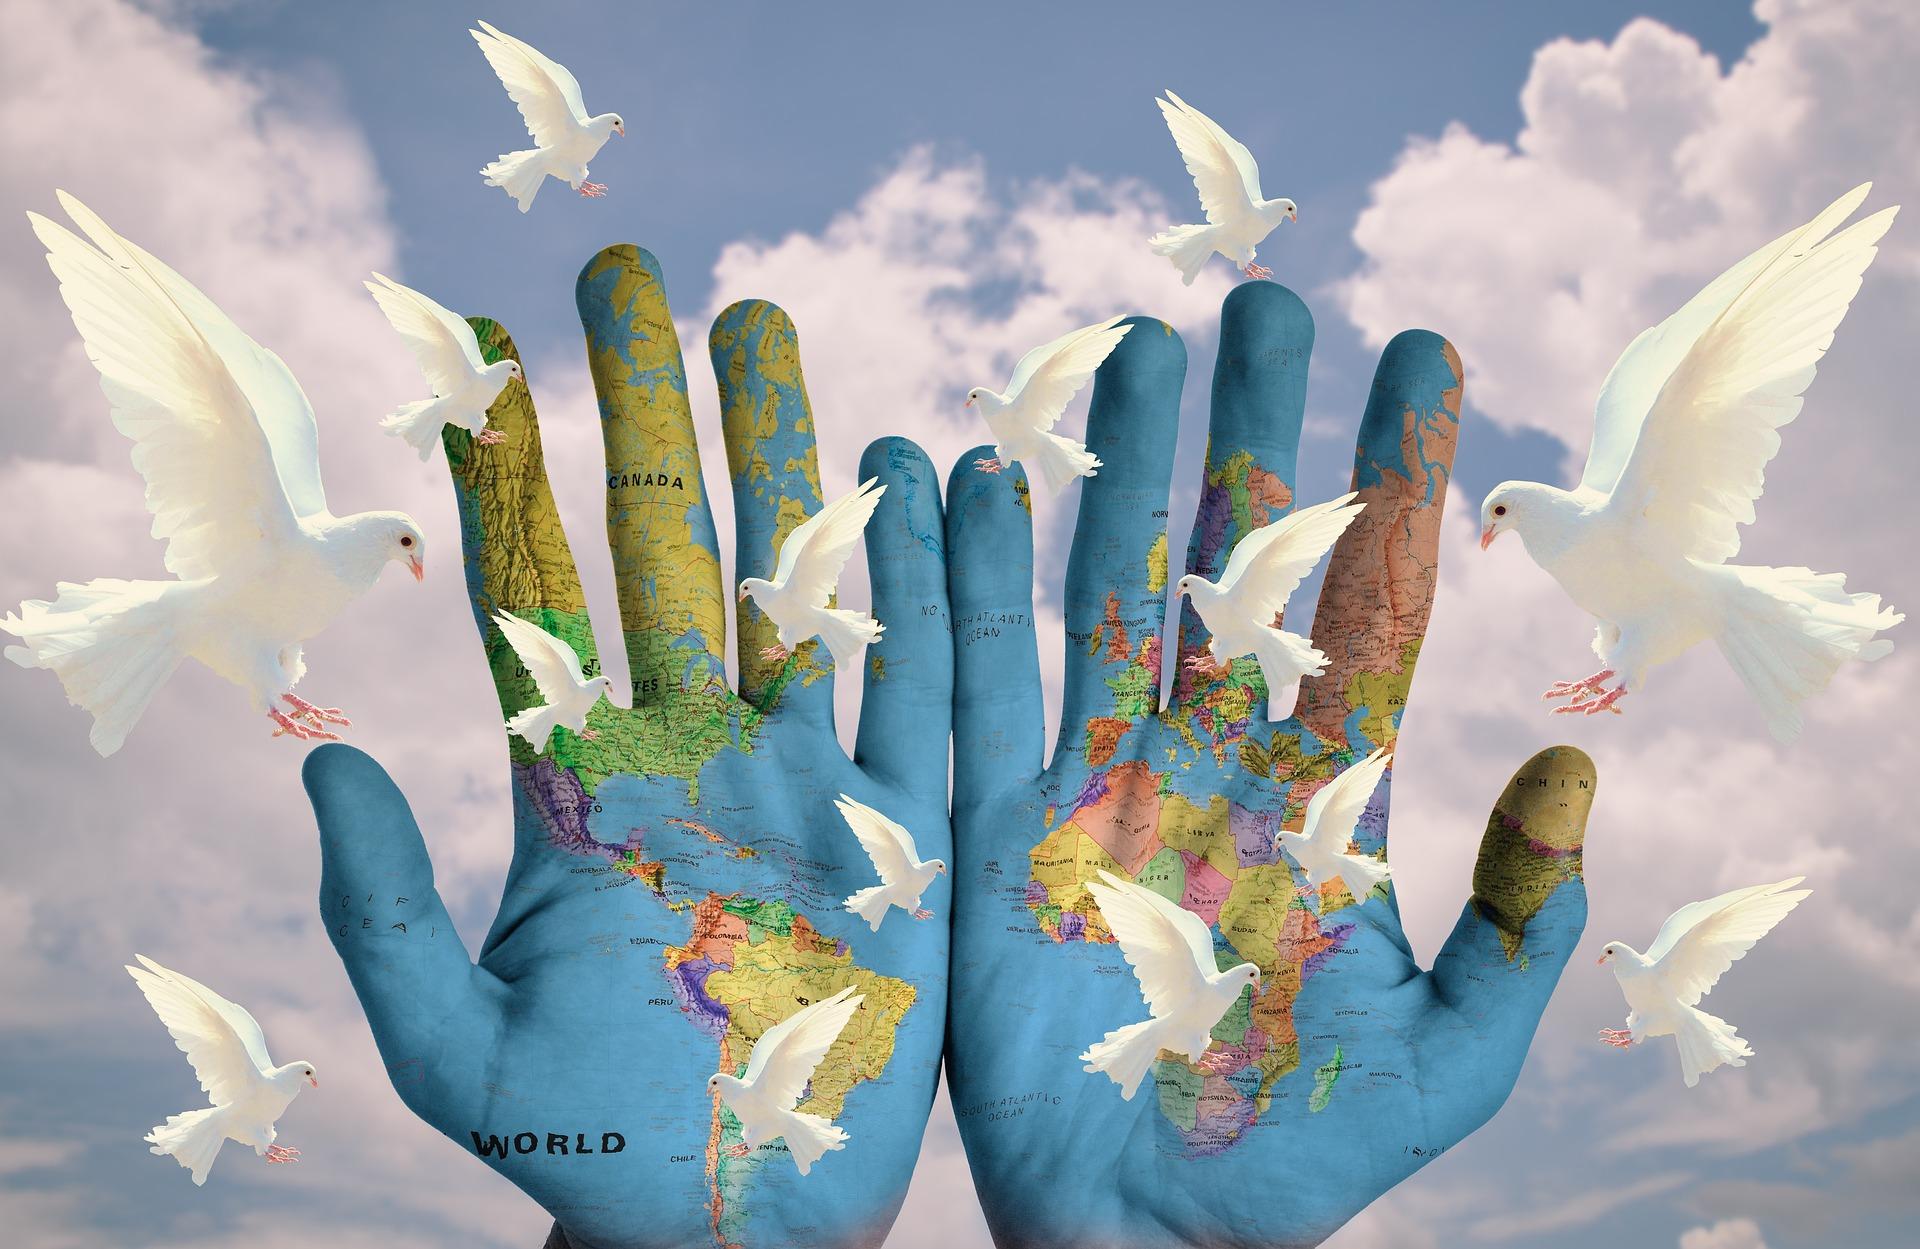 https://i0.wp.com/www.unirea.org/wp-content/uploads/2019/01/world-peace.jpg?fit=1920%2C1249&ssl=1